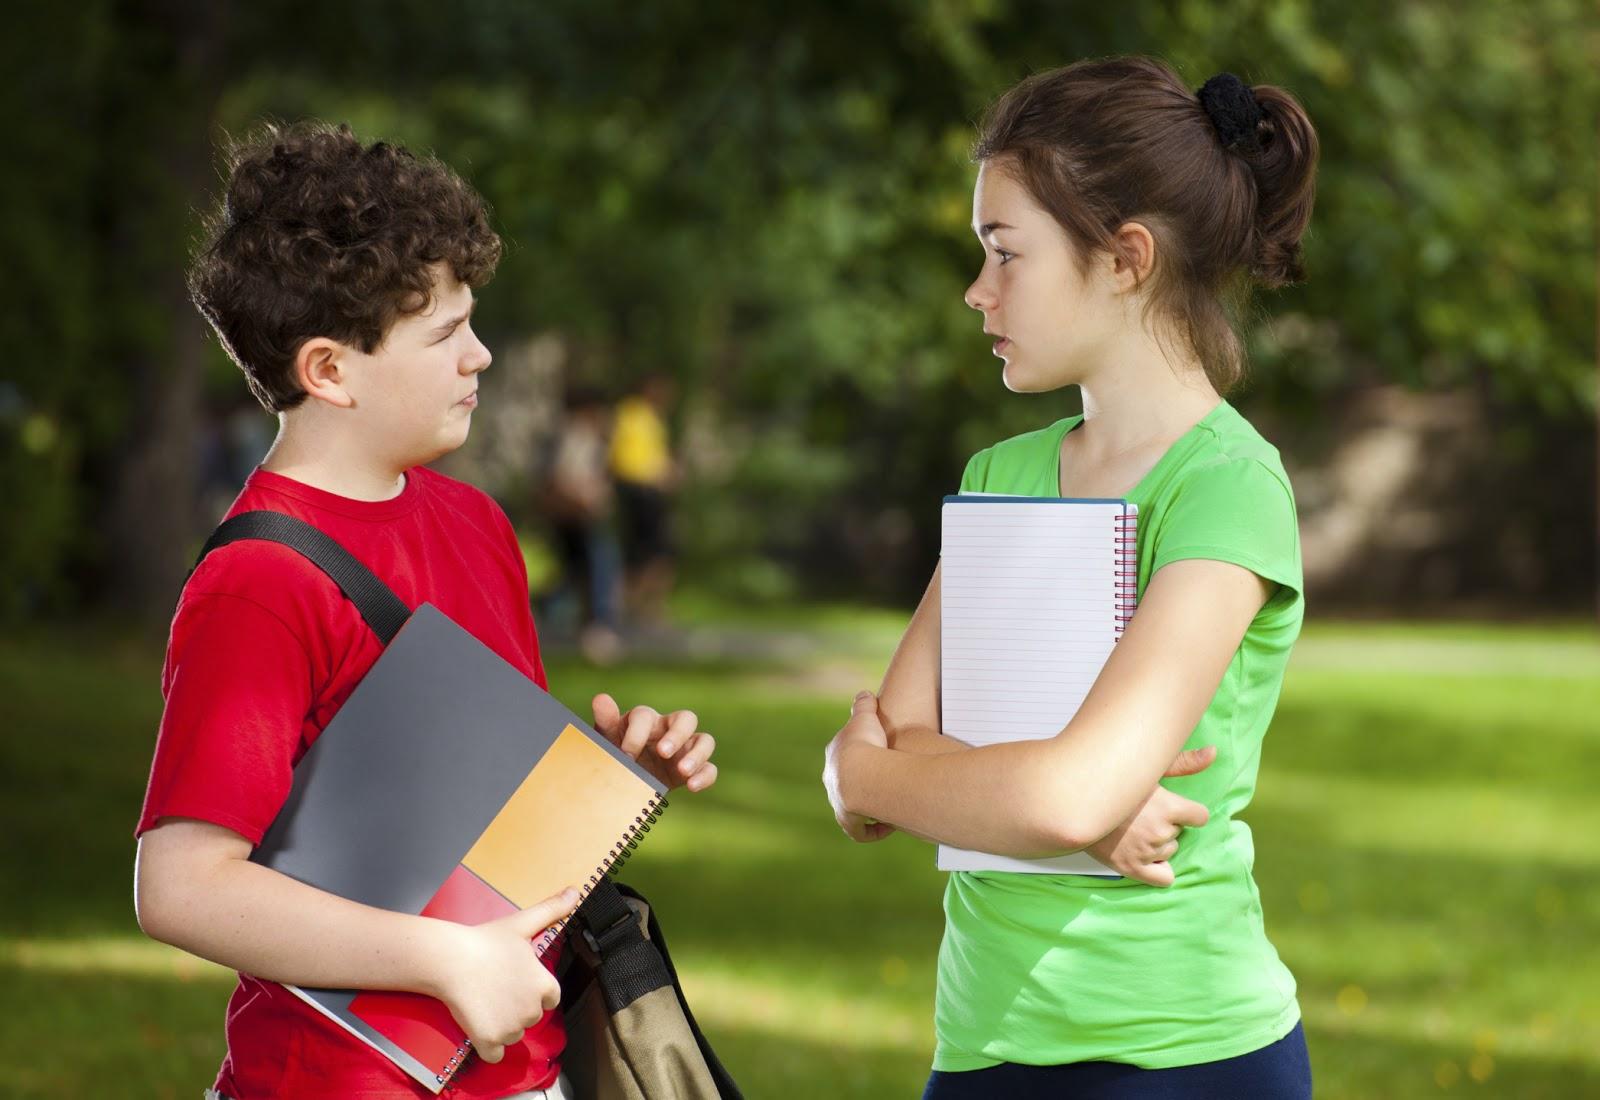 children discussion images - photo #47